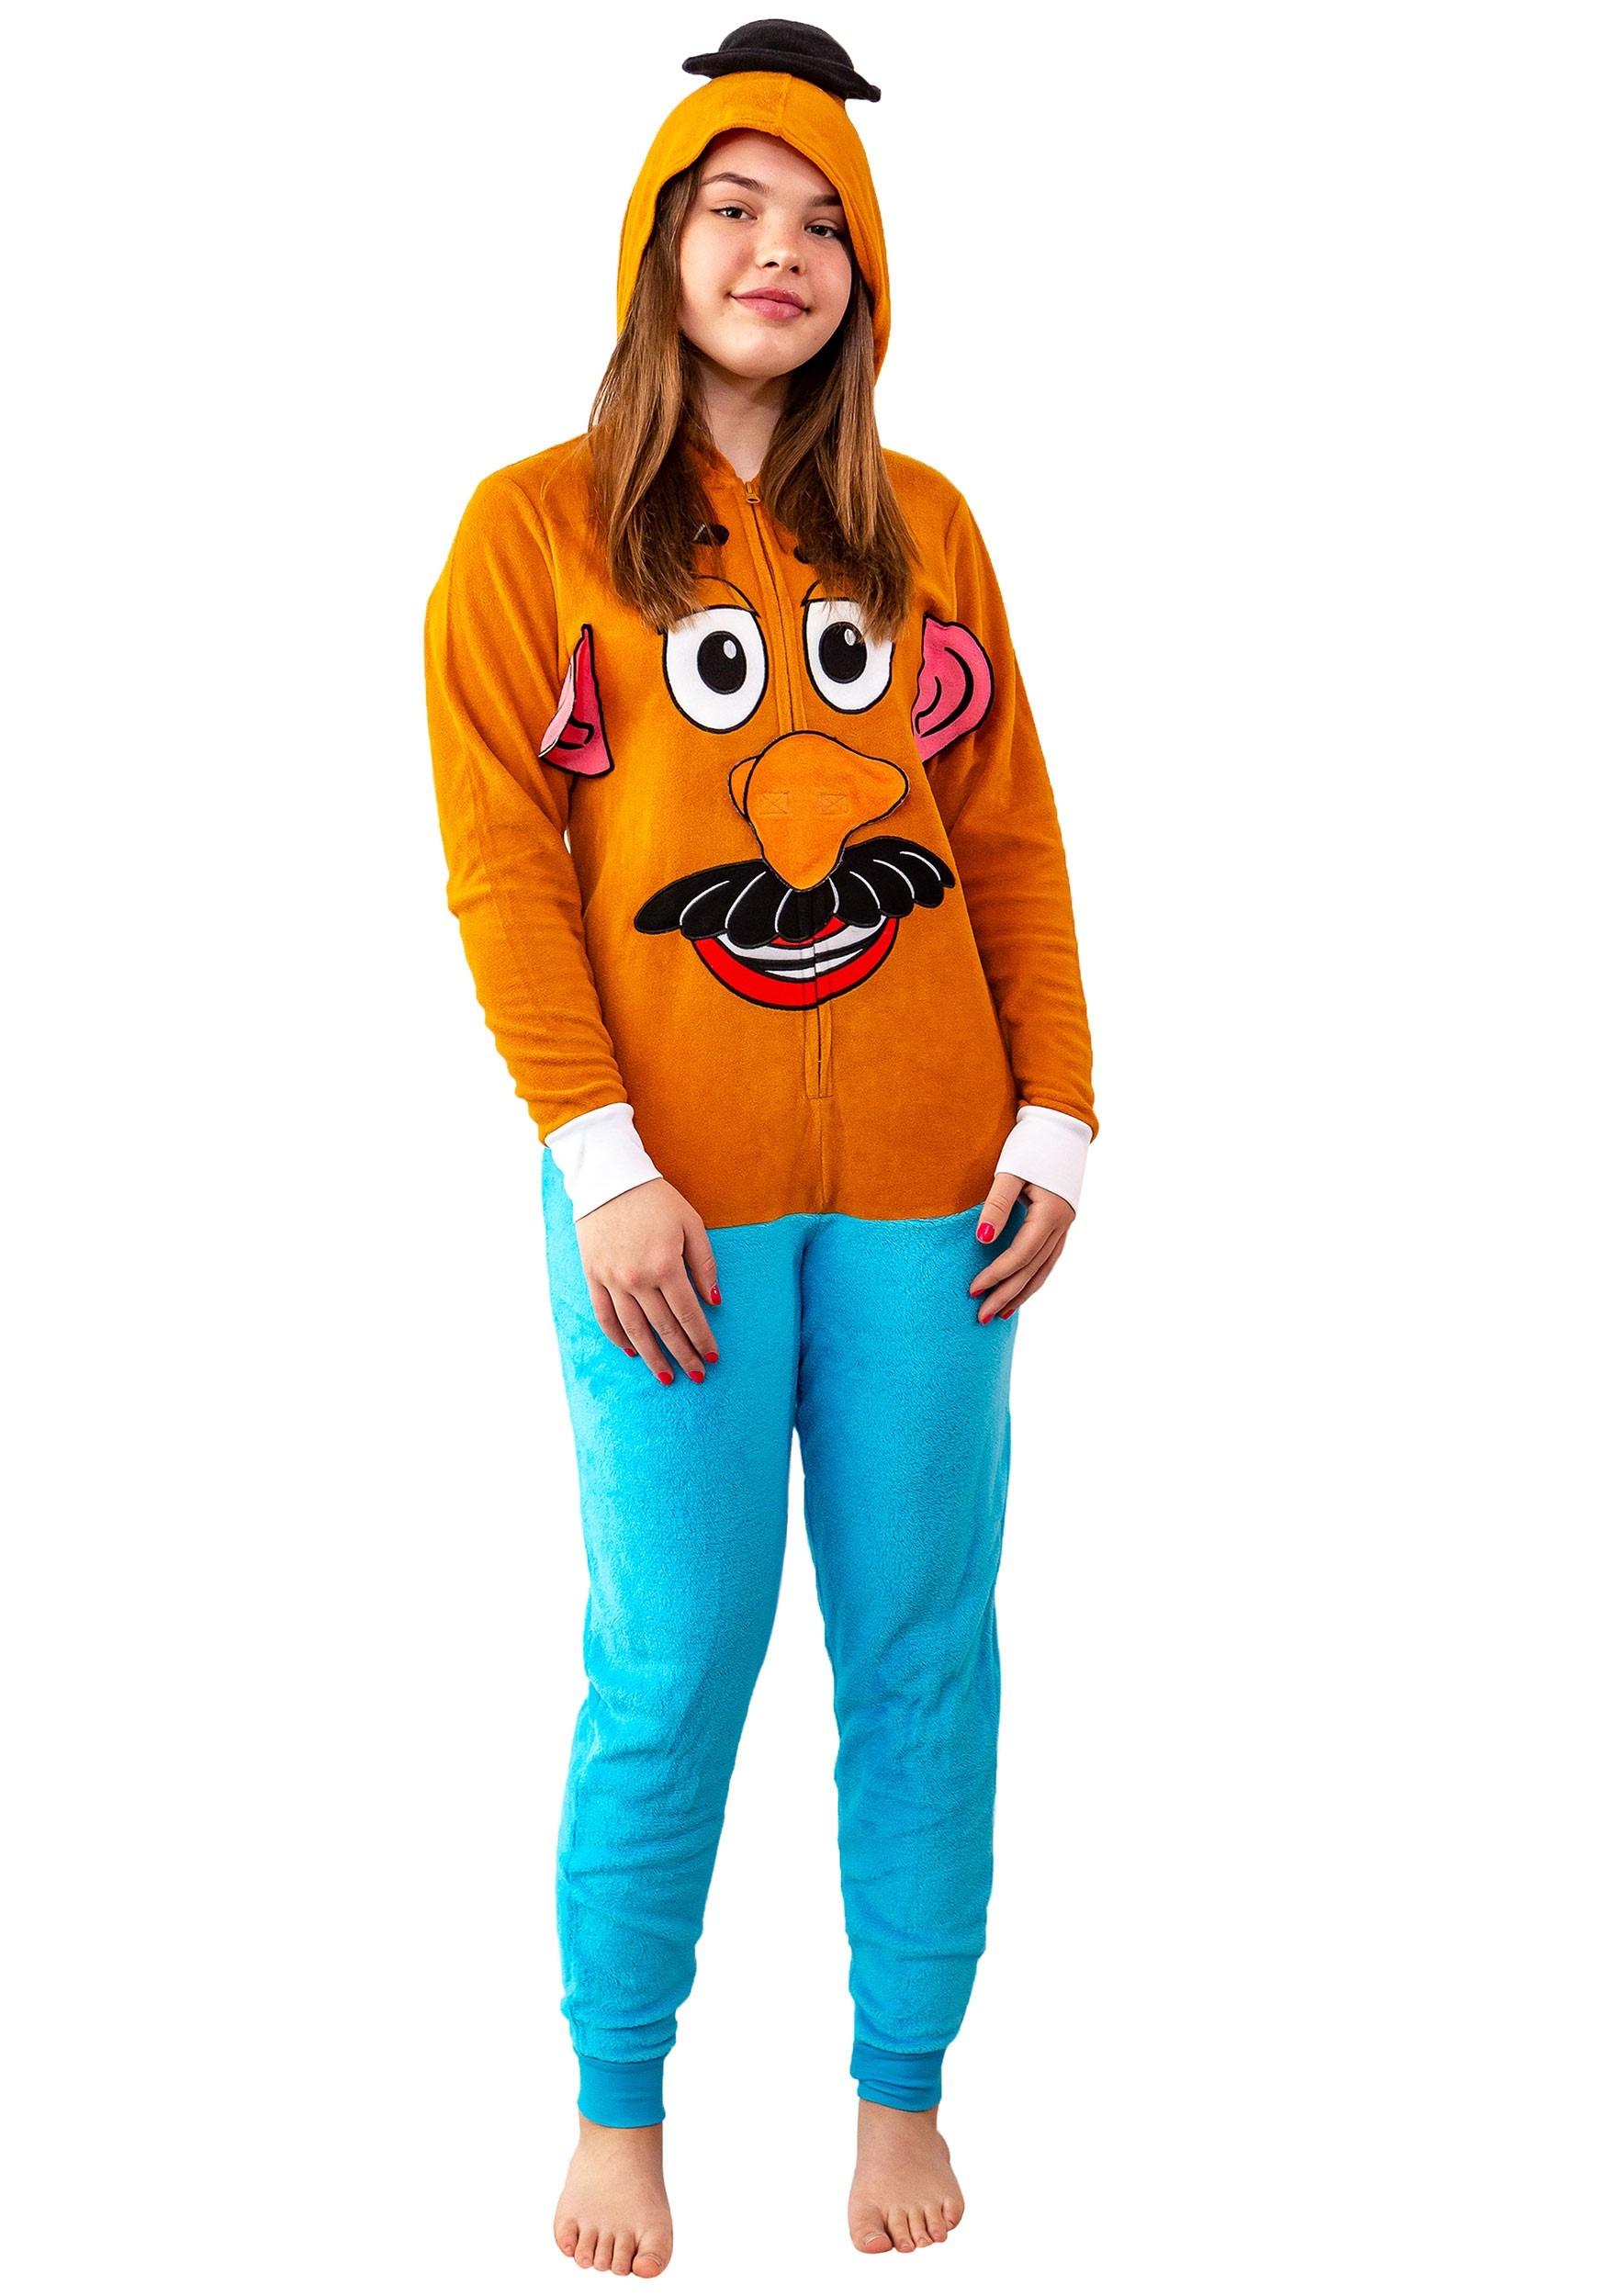 Toy Story Mr. Potato Head Womens Union Suit Costume